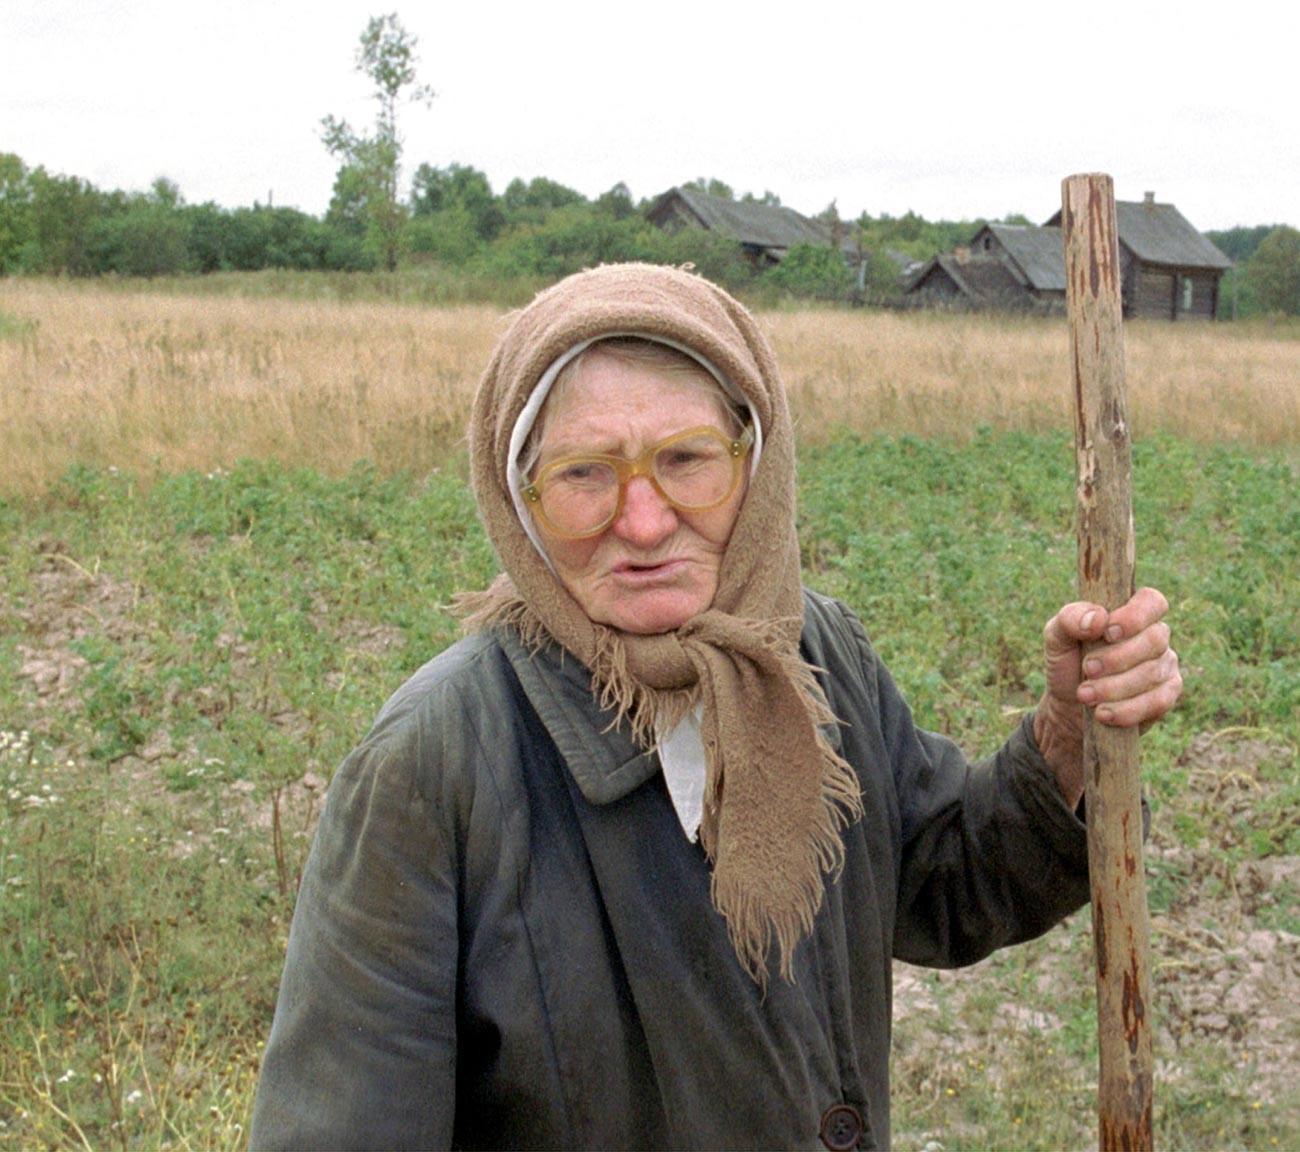 Триесет години по катастрофата, село Галкино